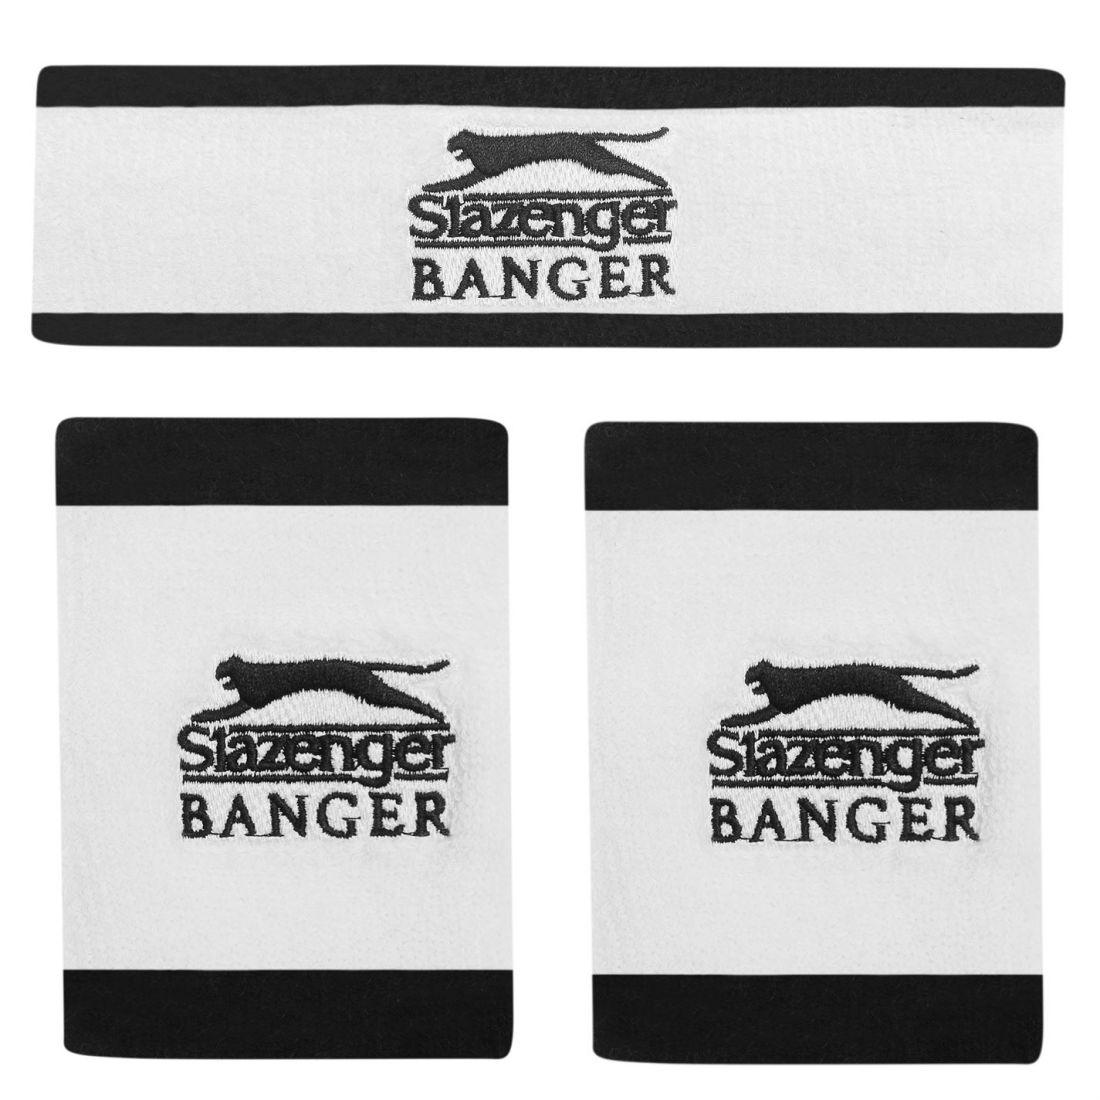 5deac59877 Image is loading Slazenger-Banger-Sweatband-Set-Unisex